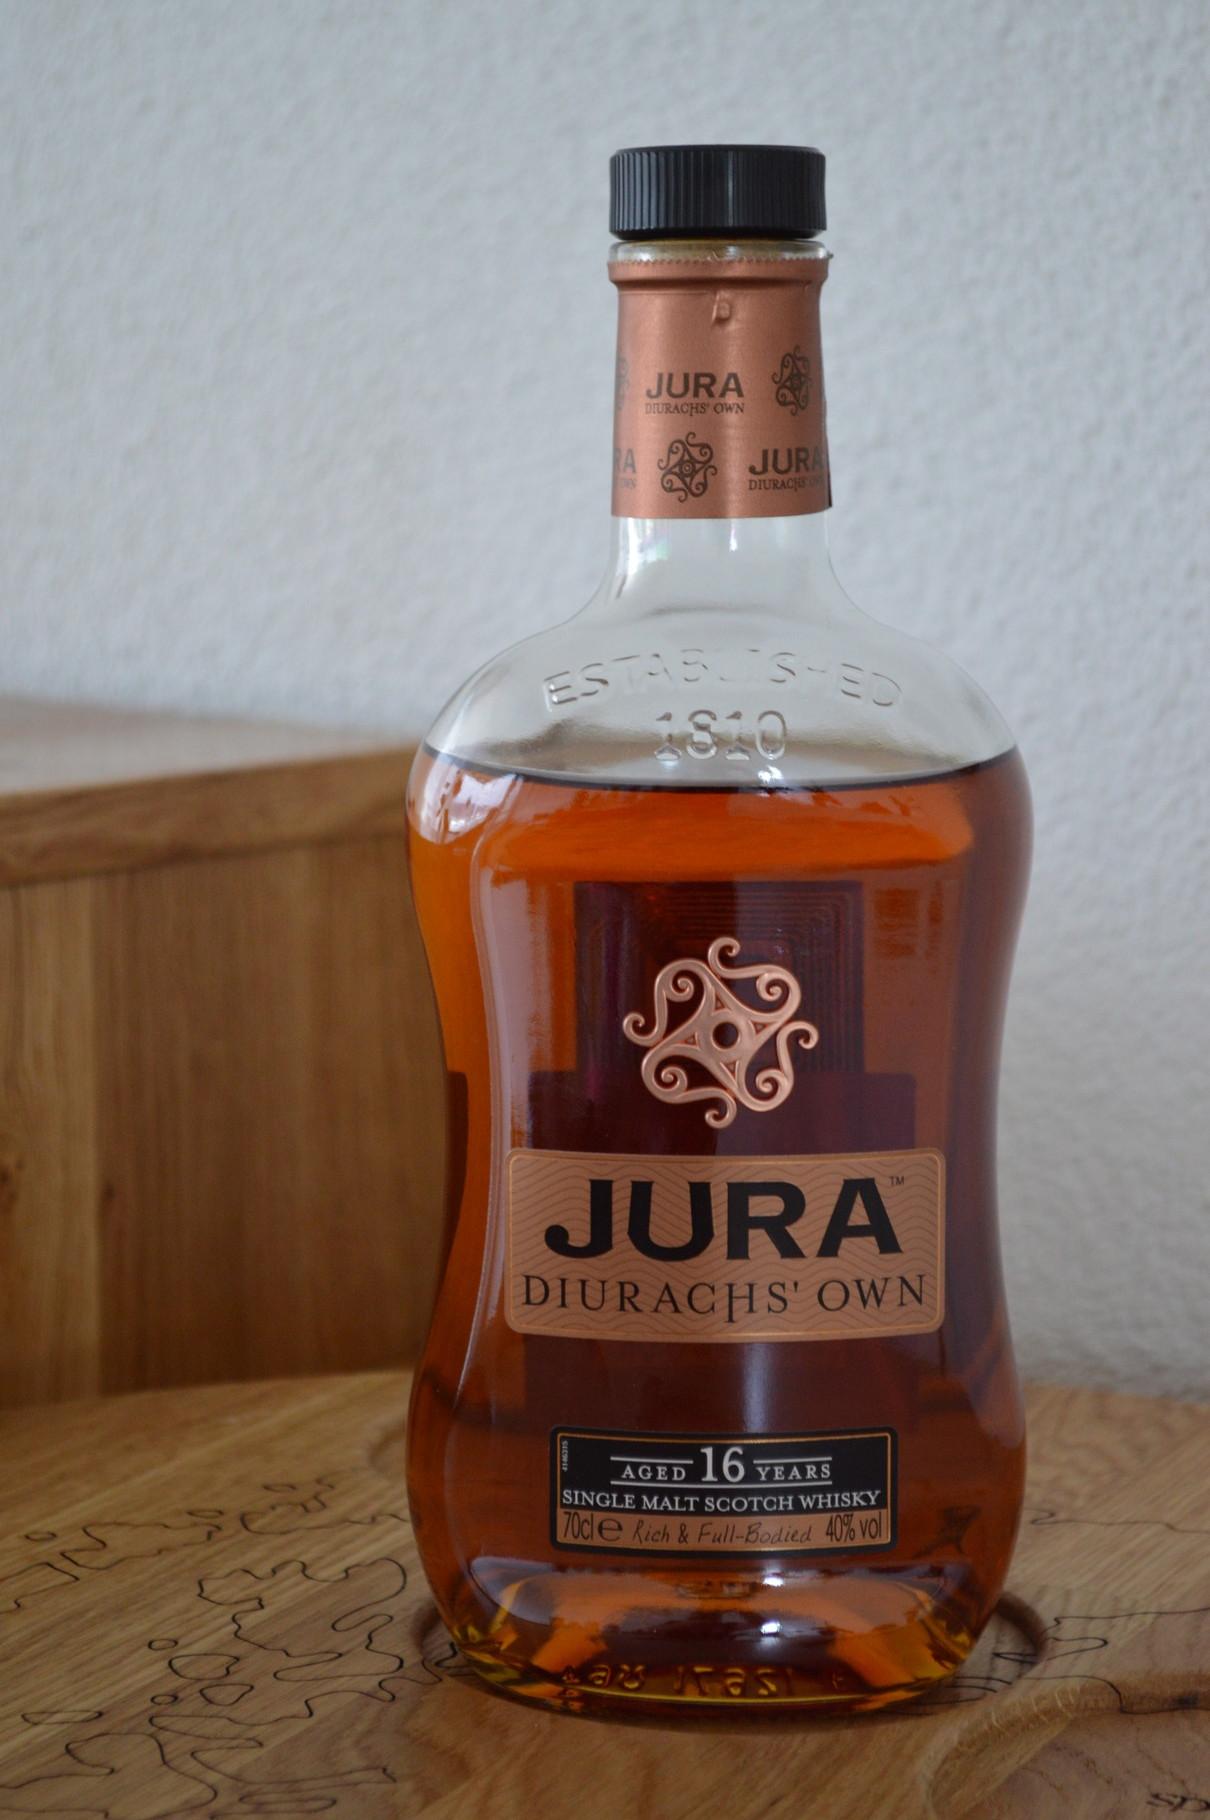 ISLANDS - Jura* - Aged: 16 years - Bottler: Original - 70cl - 40% - Diurachs Own